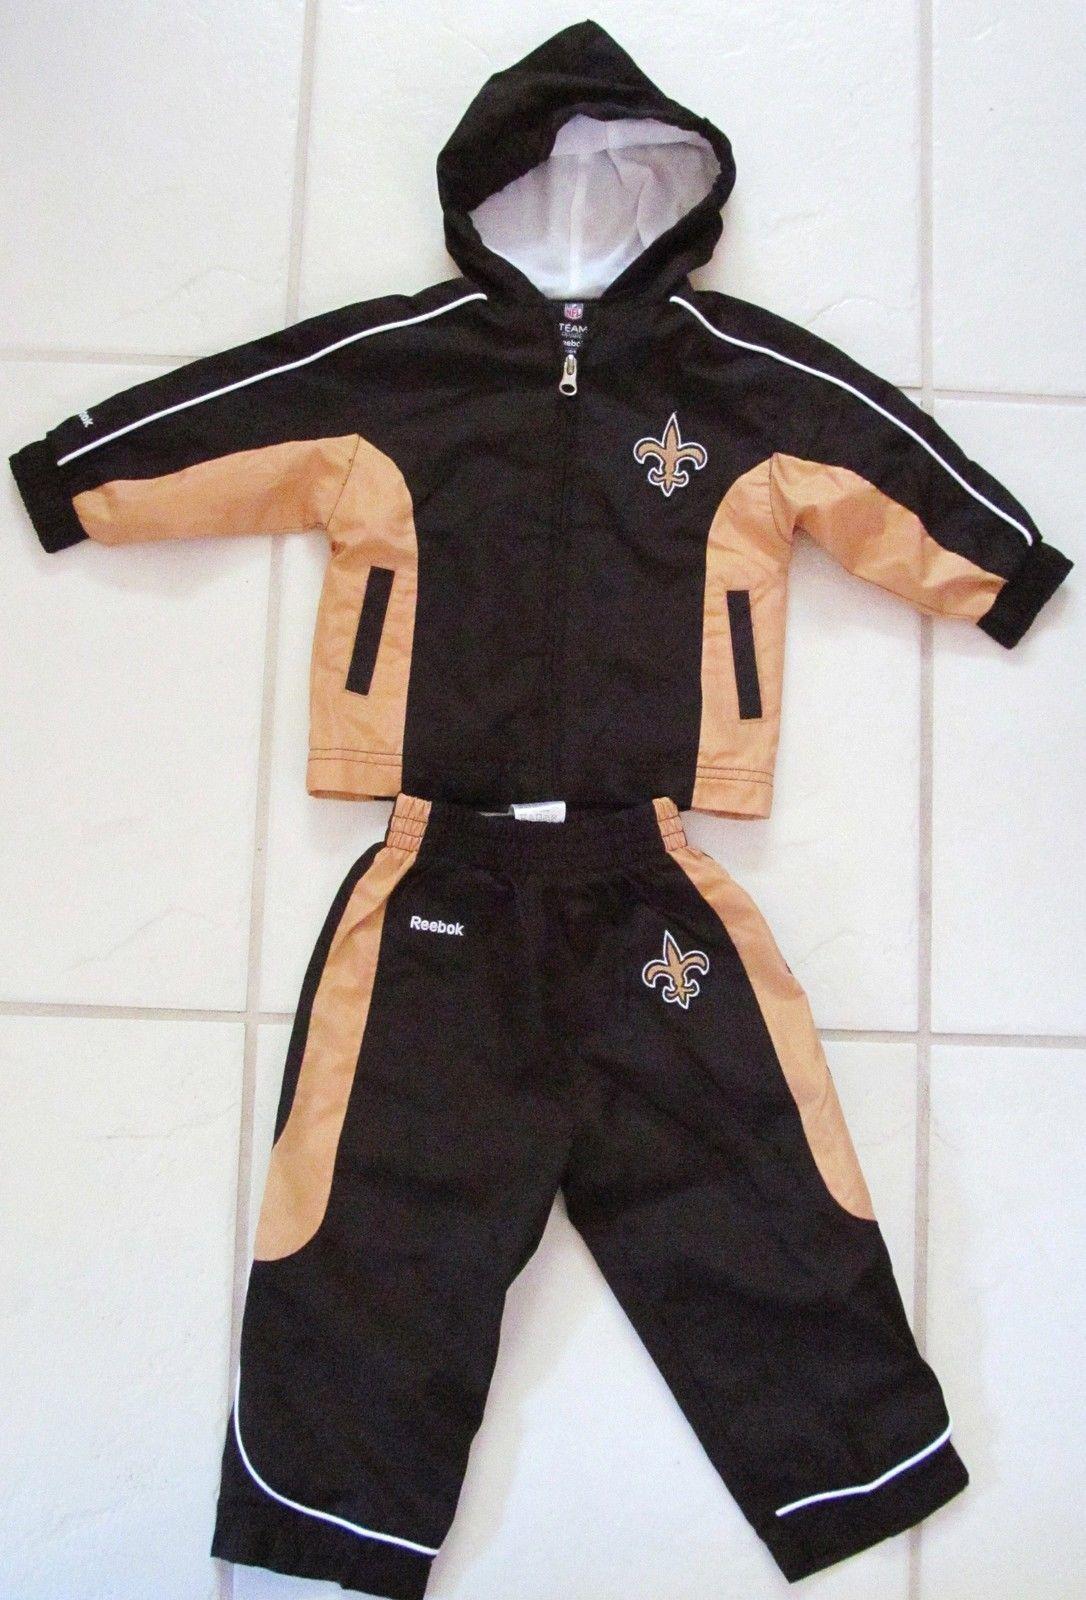 bc30242b Nfl Team Apparel Reebok Kids Jacket and 43 similar items